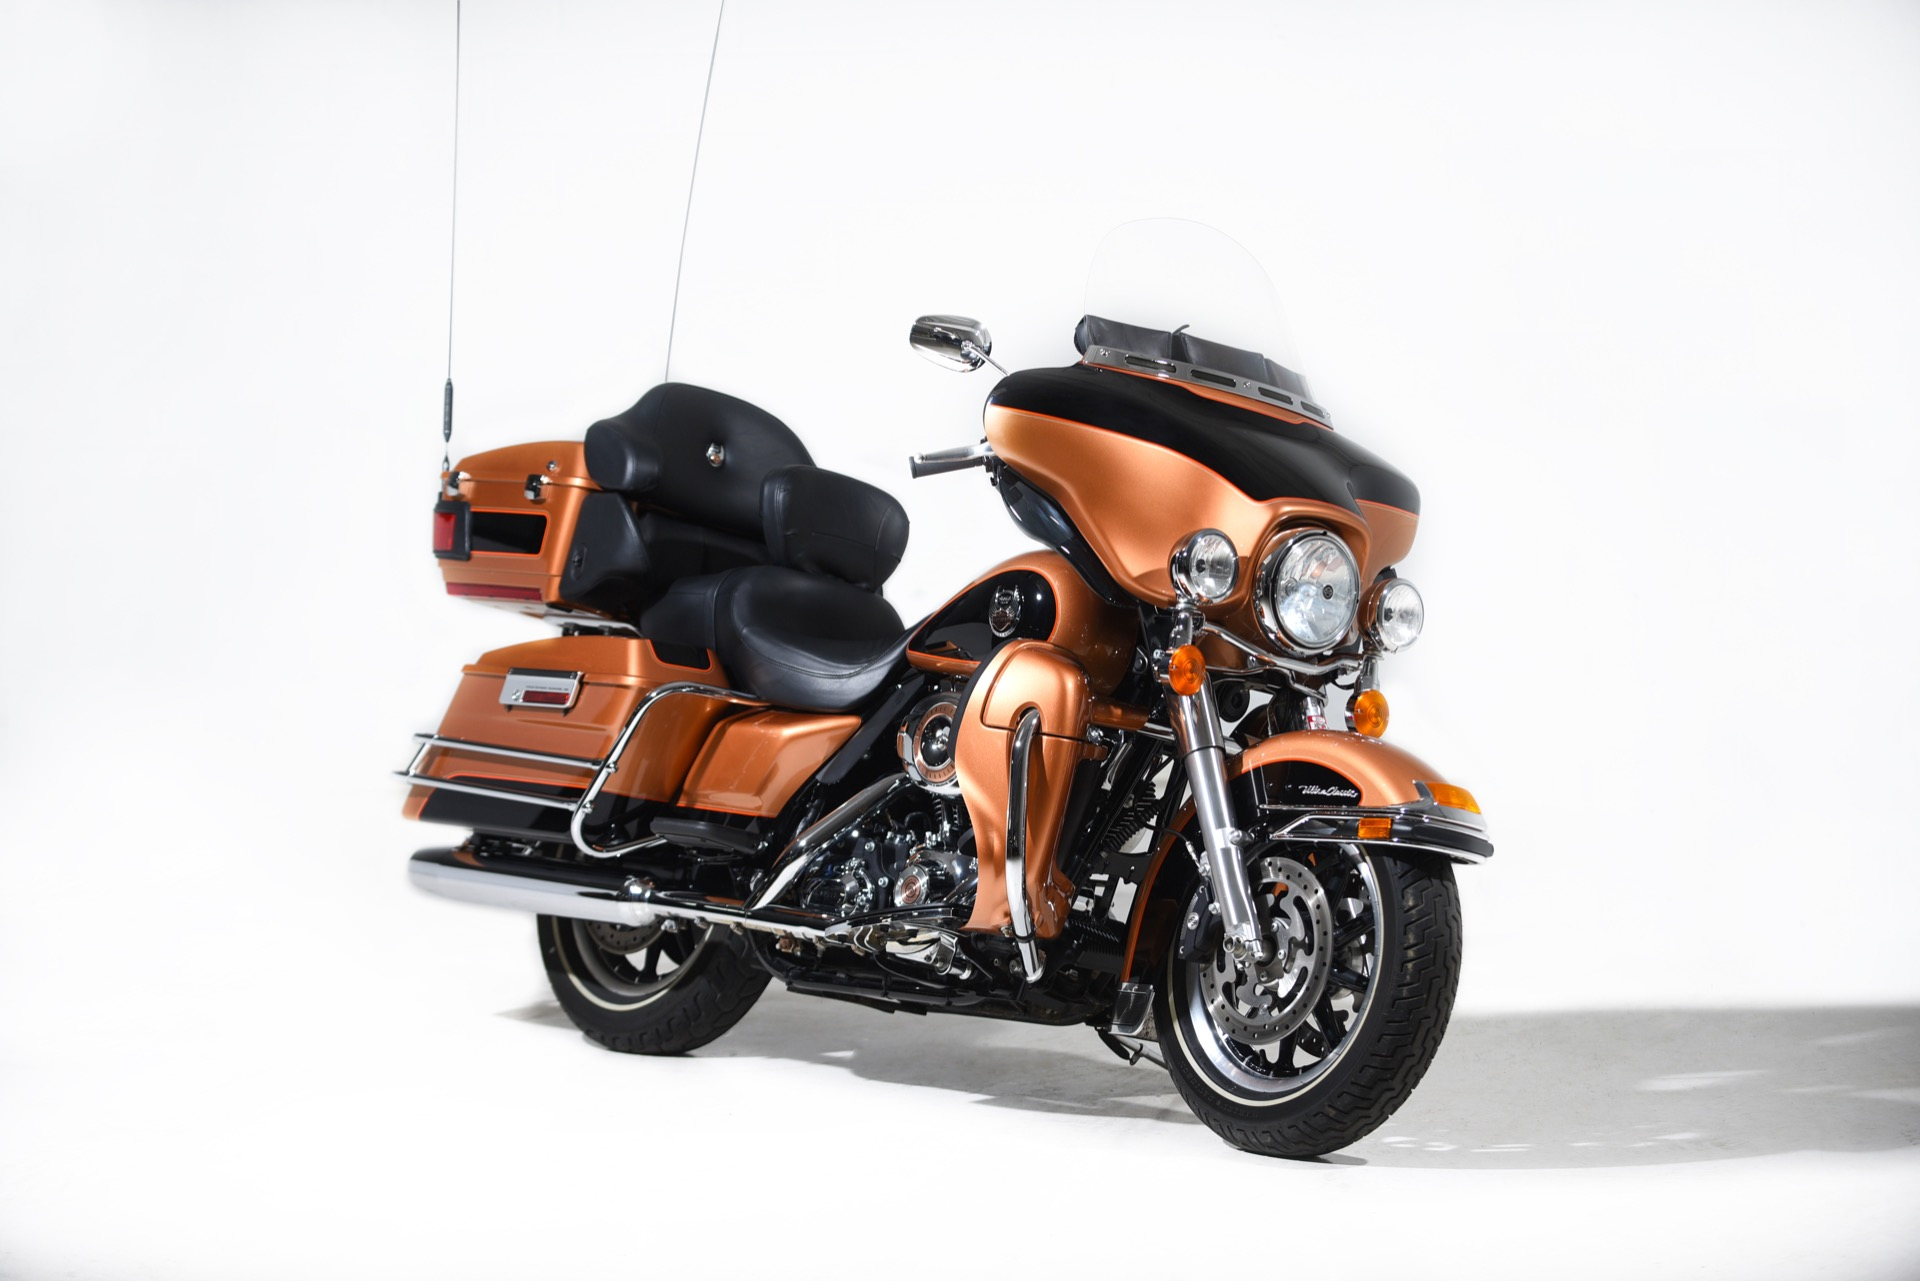 Used 2008 Harley-Davidson Electra Glide Ultra Classic | Farmingdale, NY